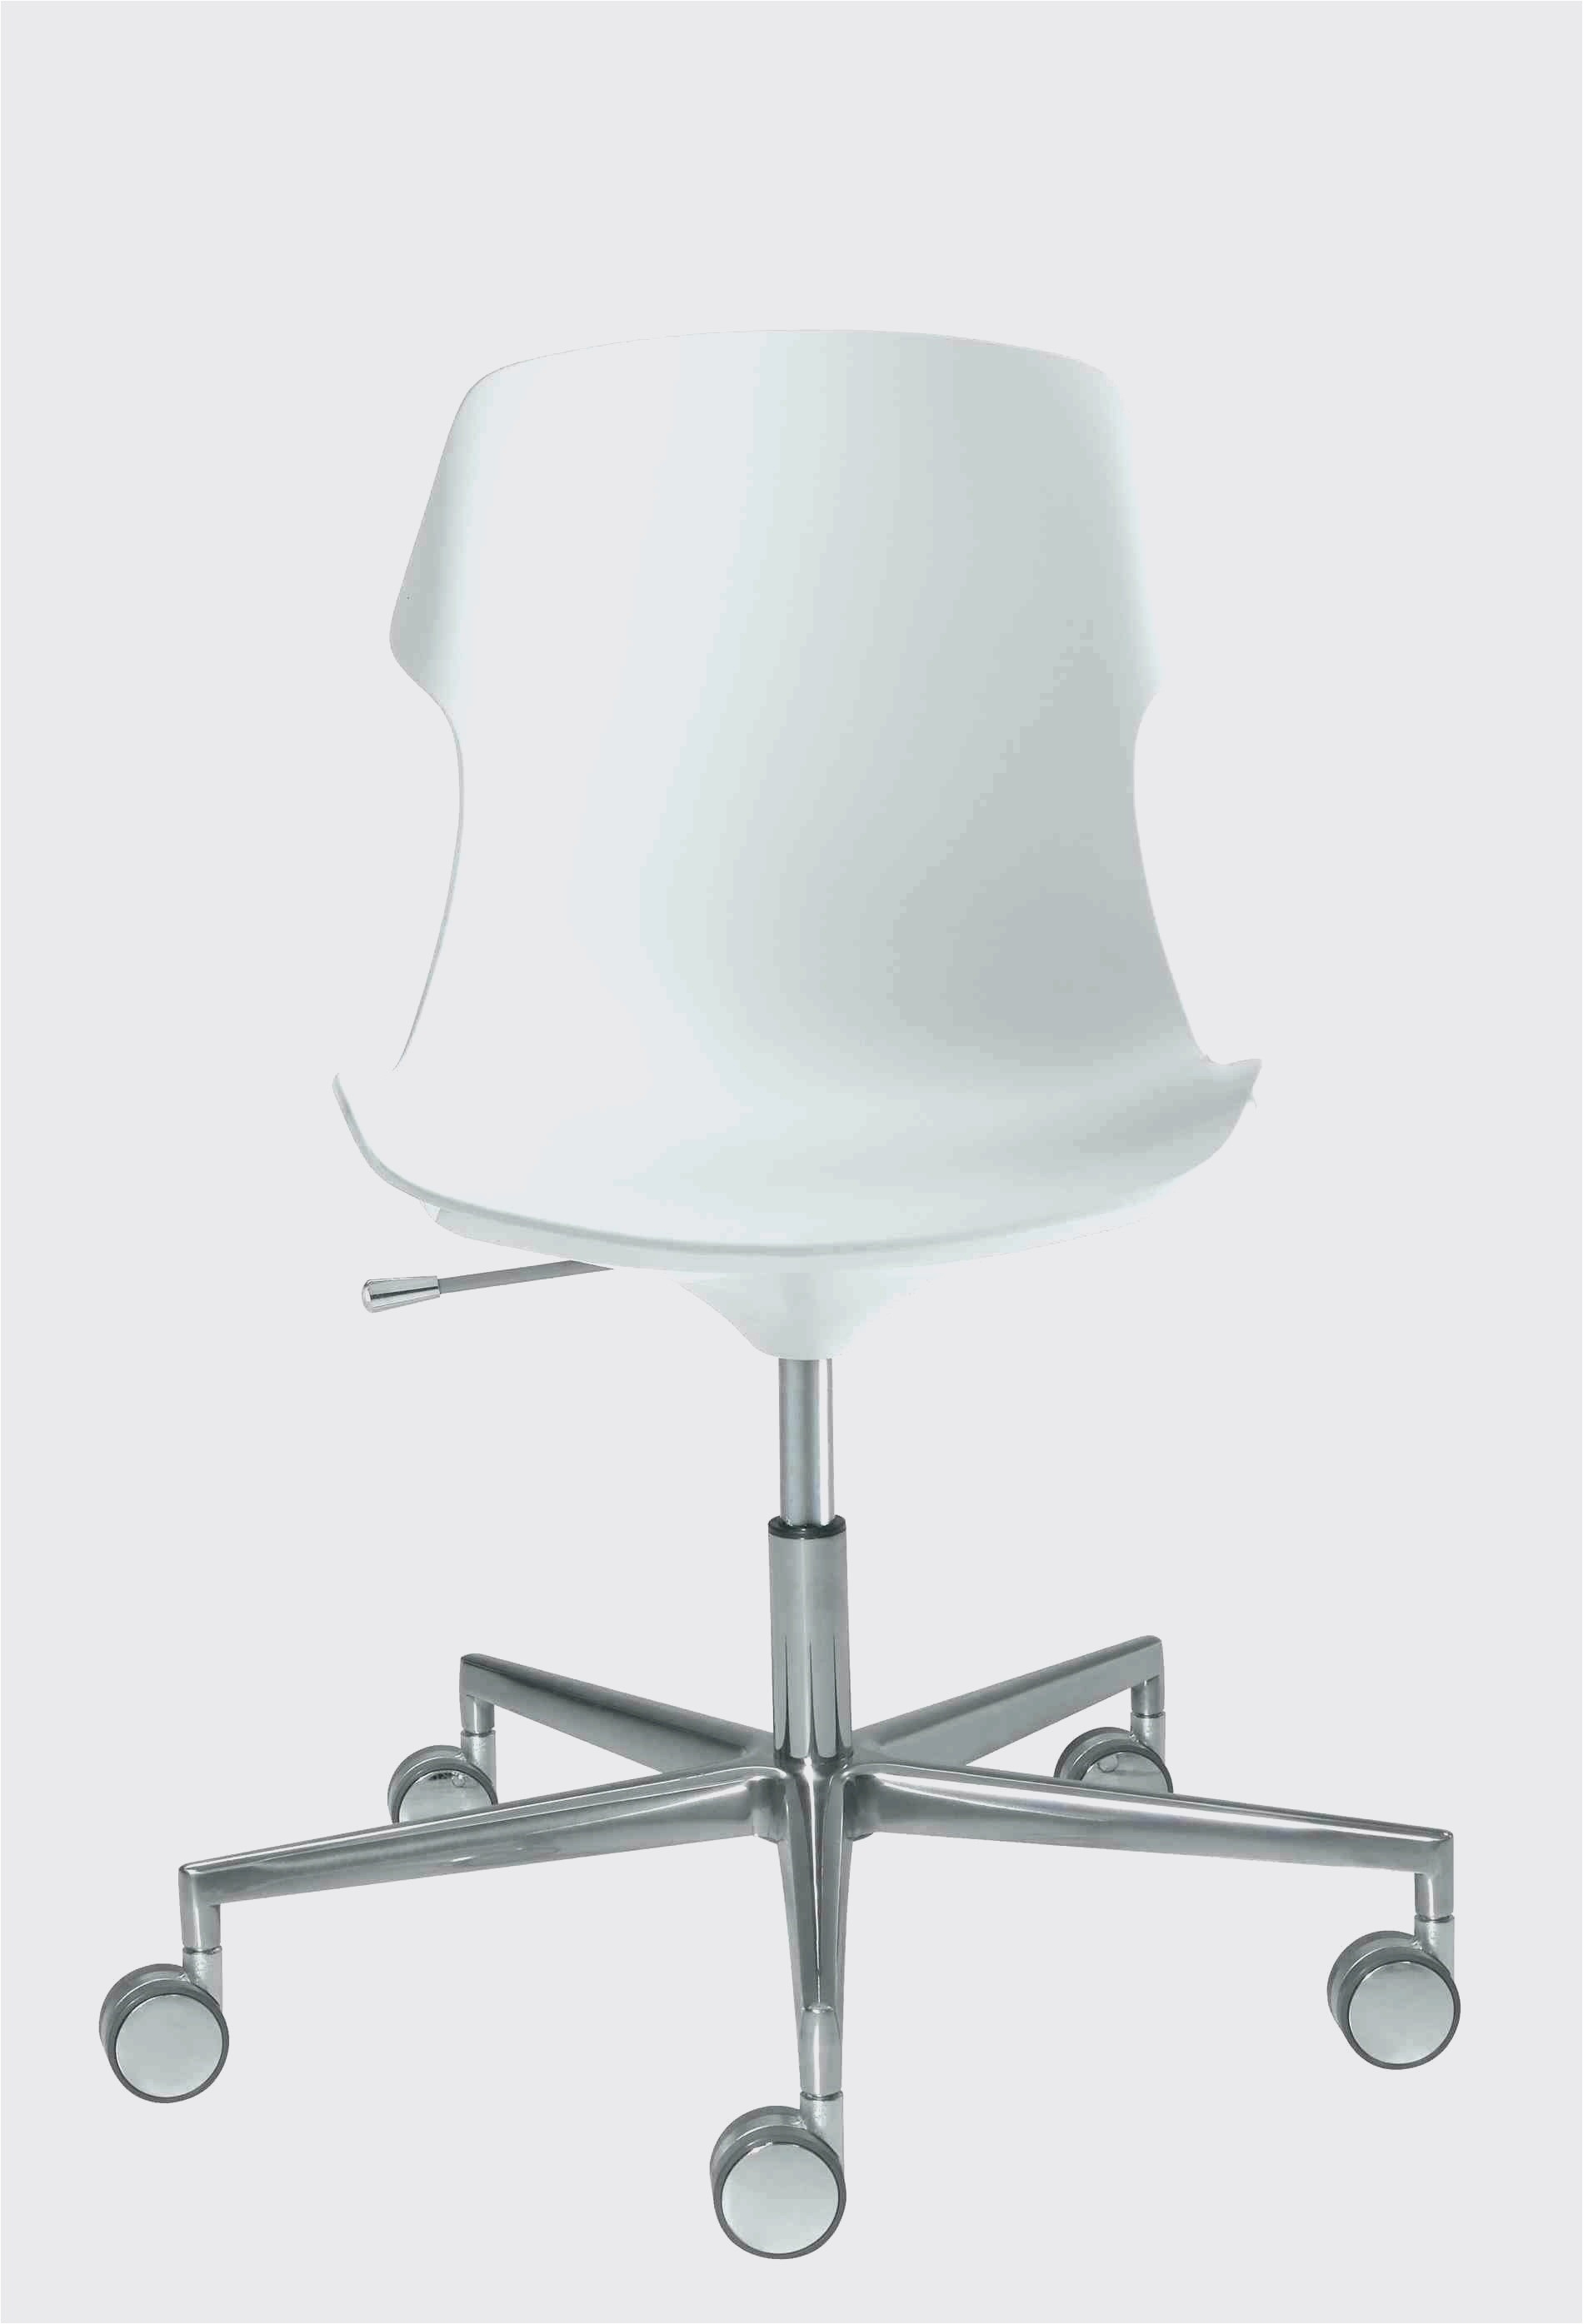 Meuble Rangement Fly Élégant Images Papier Adhesif Meuble Luxe Meuble Fly Impressionnant Chaise Fly 0d